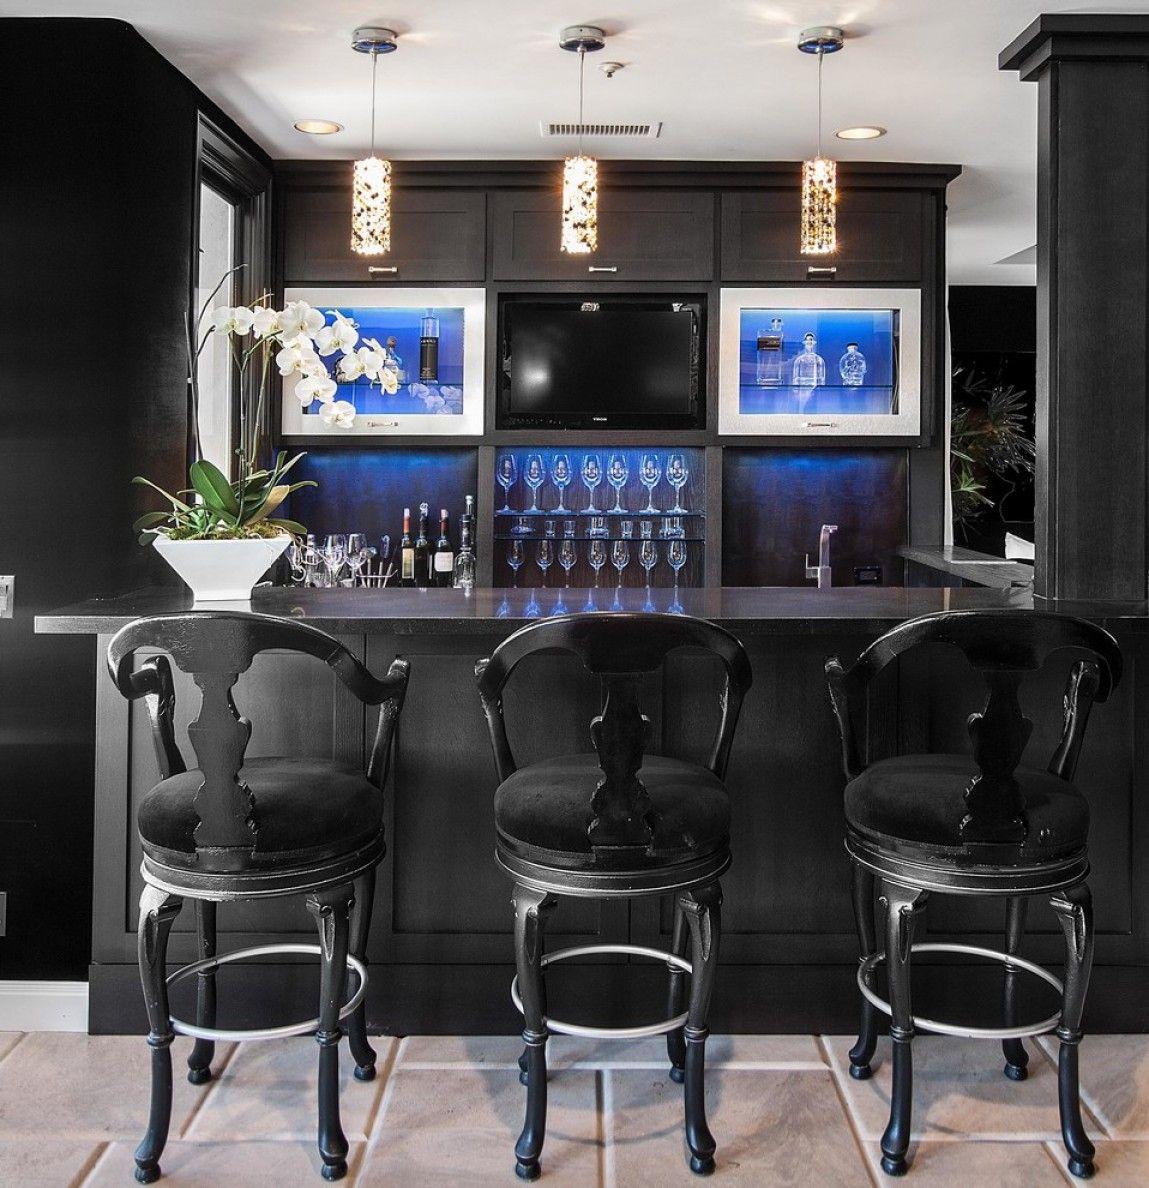 Pin On Home Bars Wine Cellars Ideas For A Lavish Lush